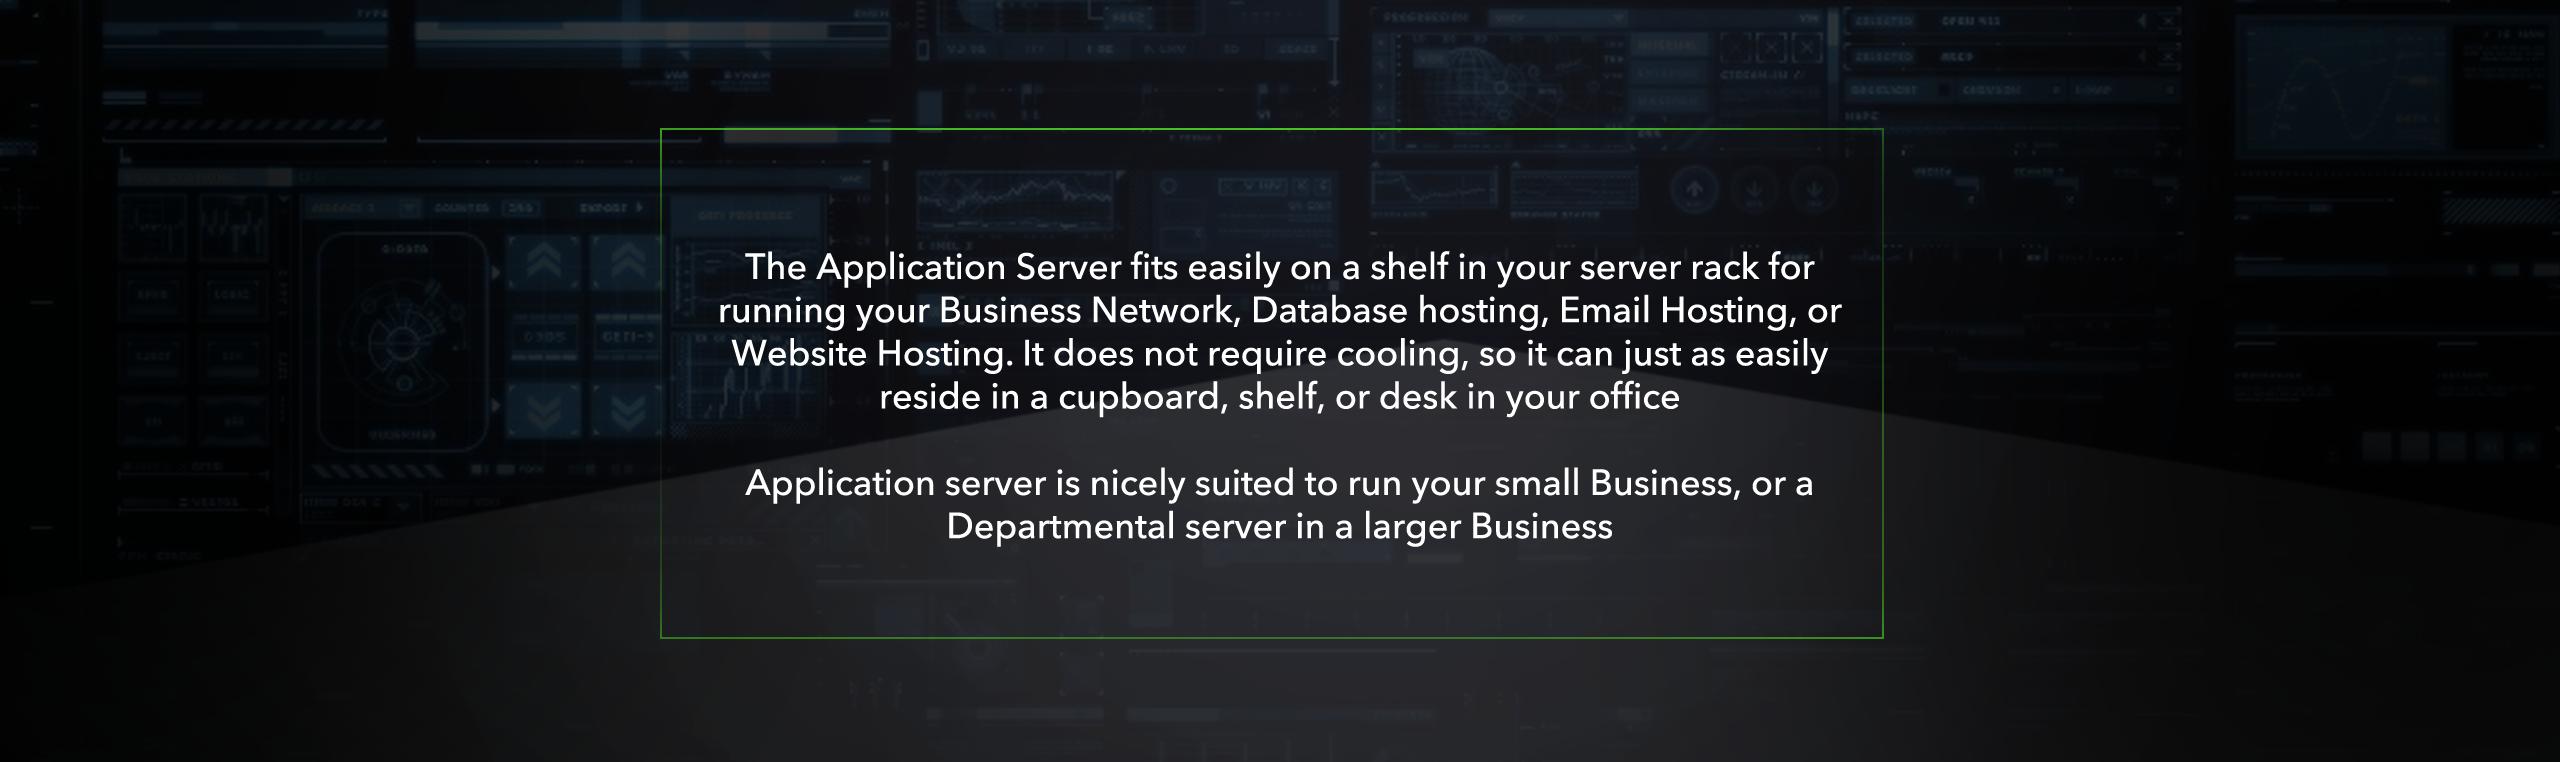 Operating Systems RedHat Ubuntu Centos